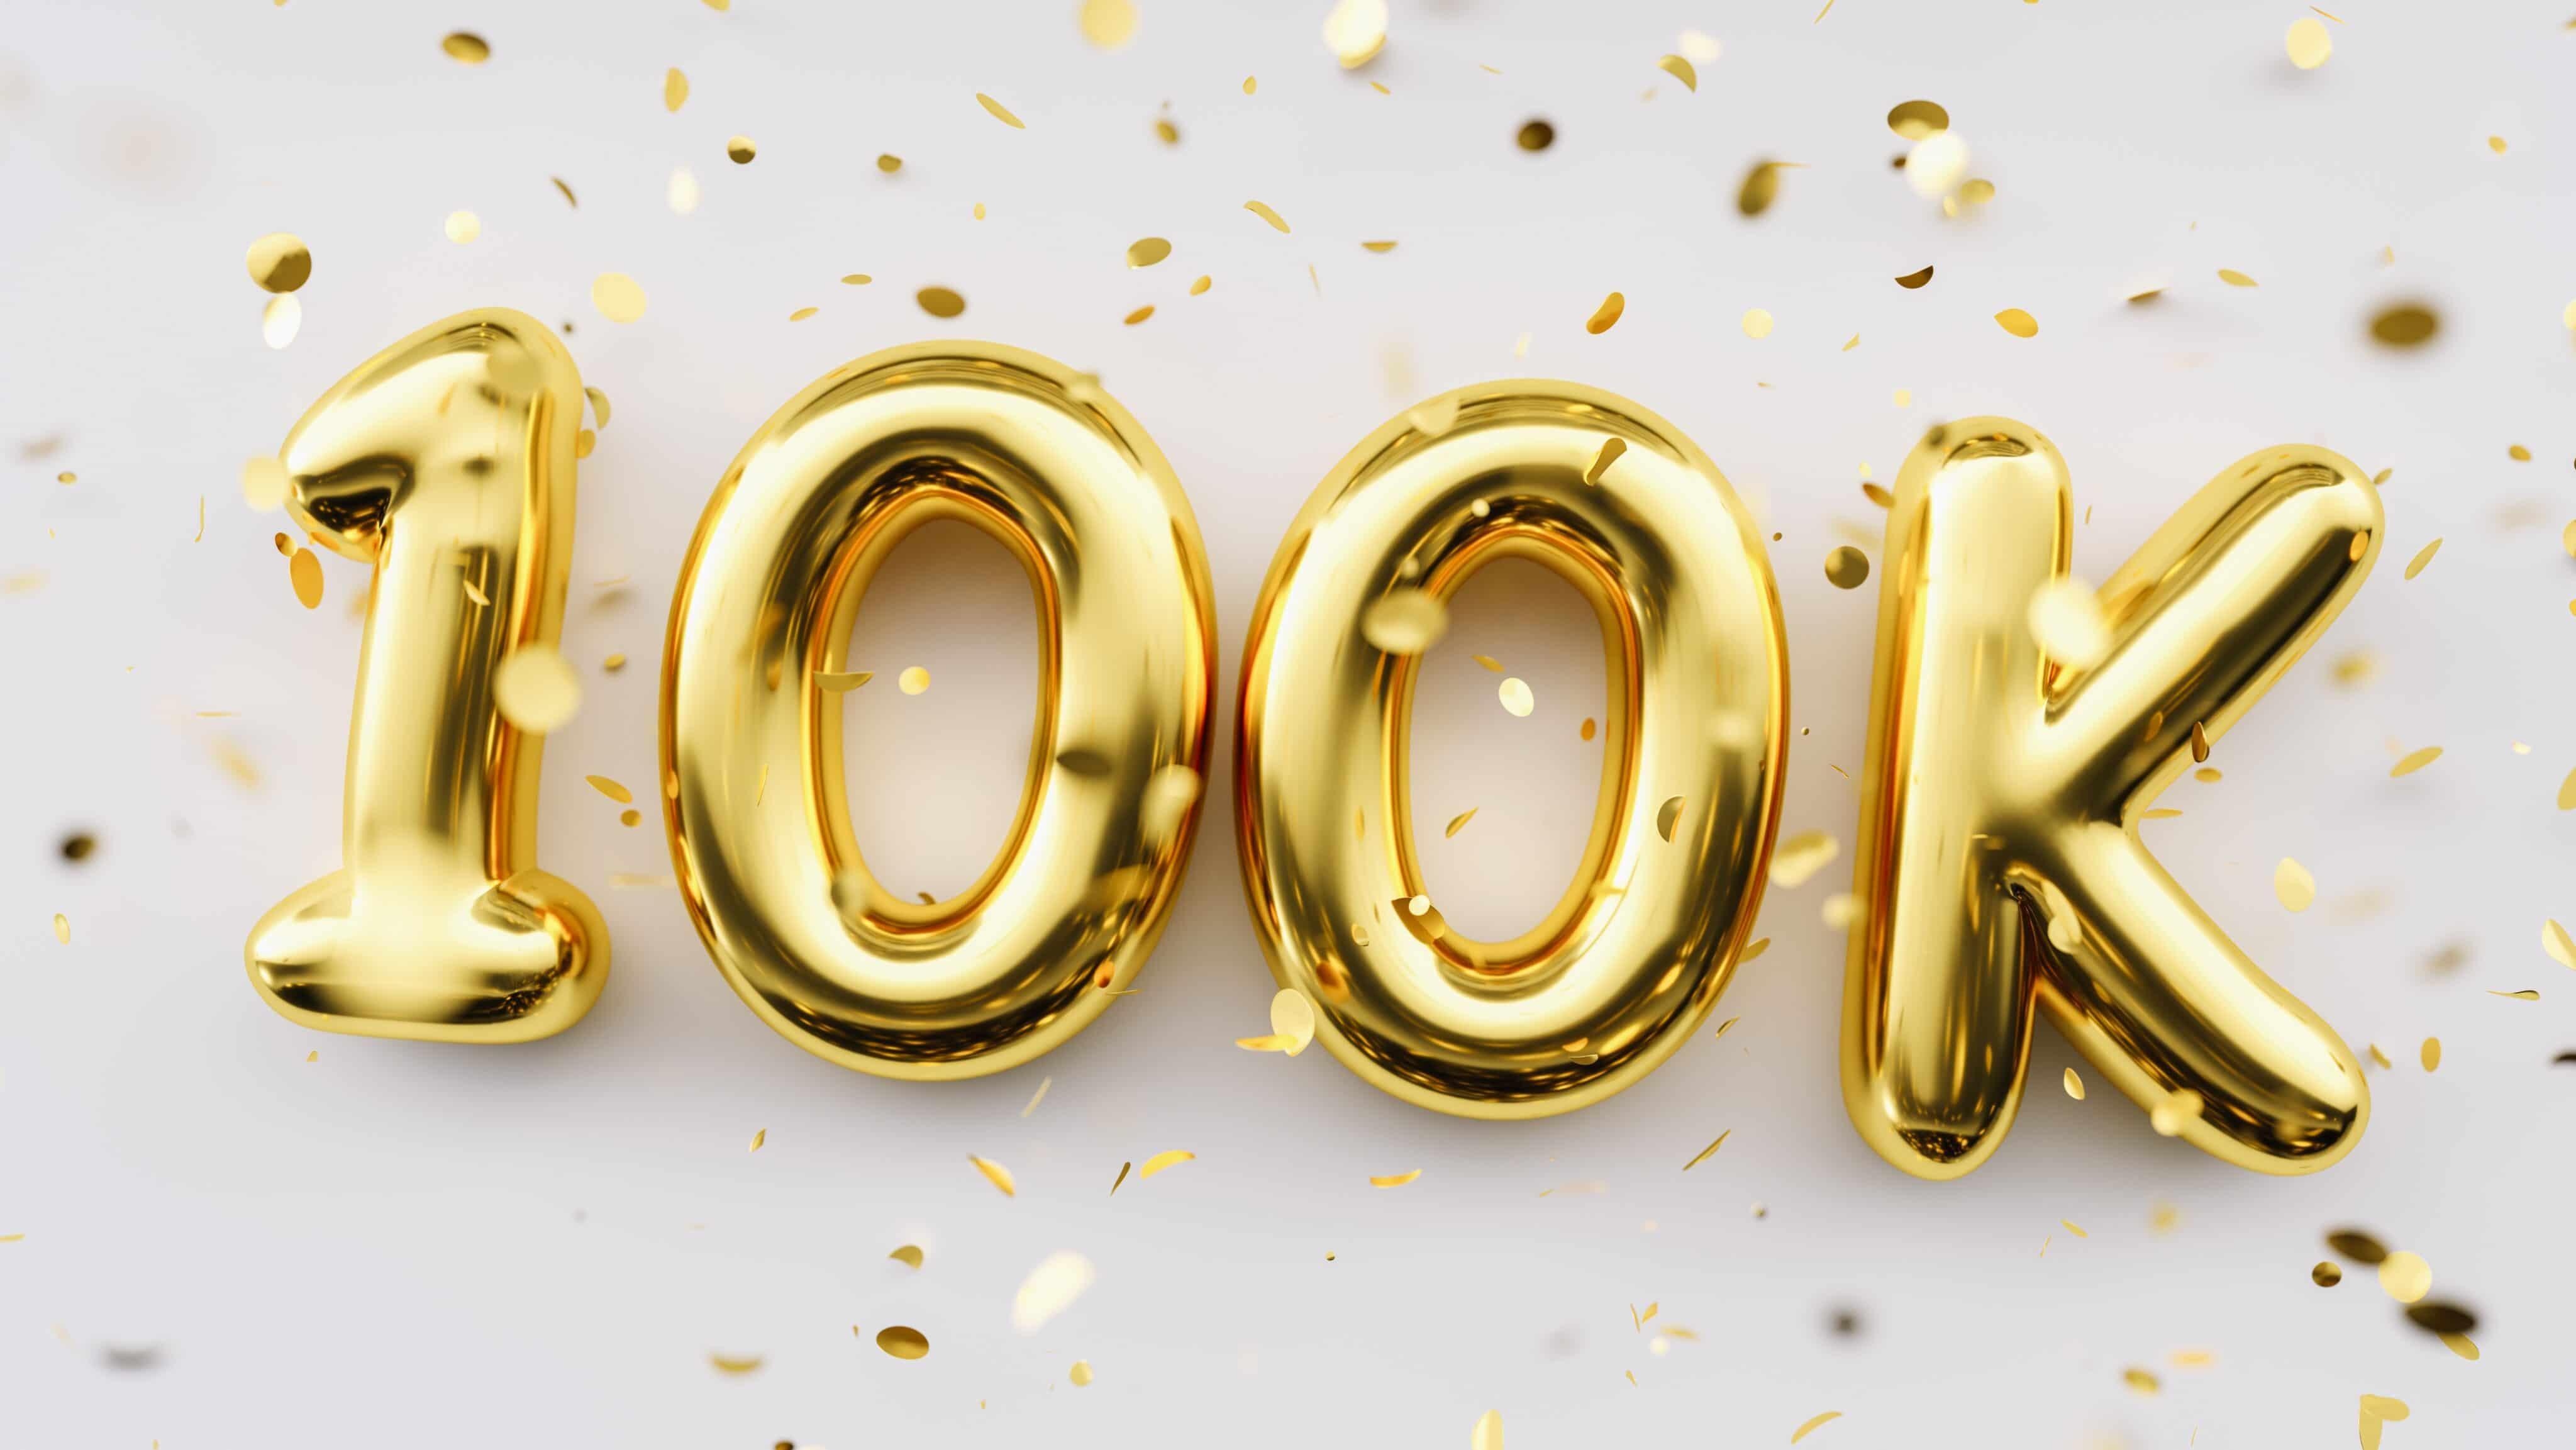 100K (balões comemorando 100 mil)